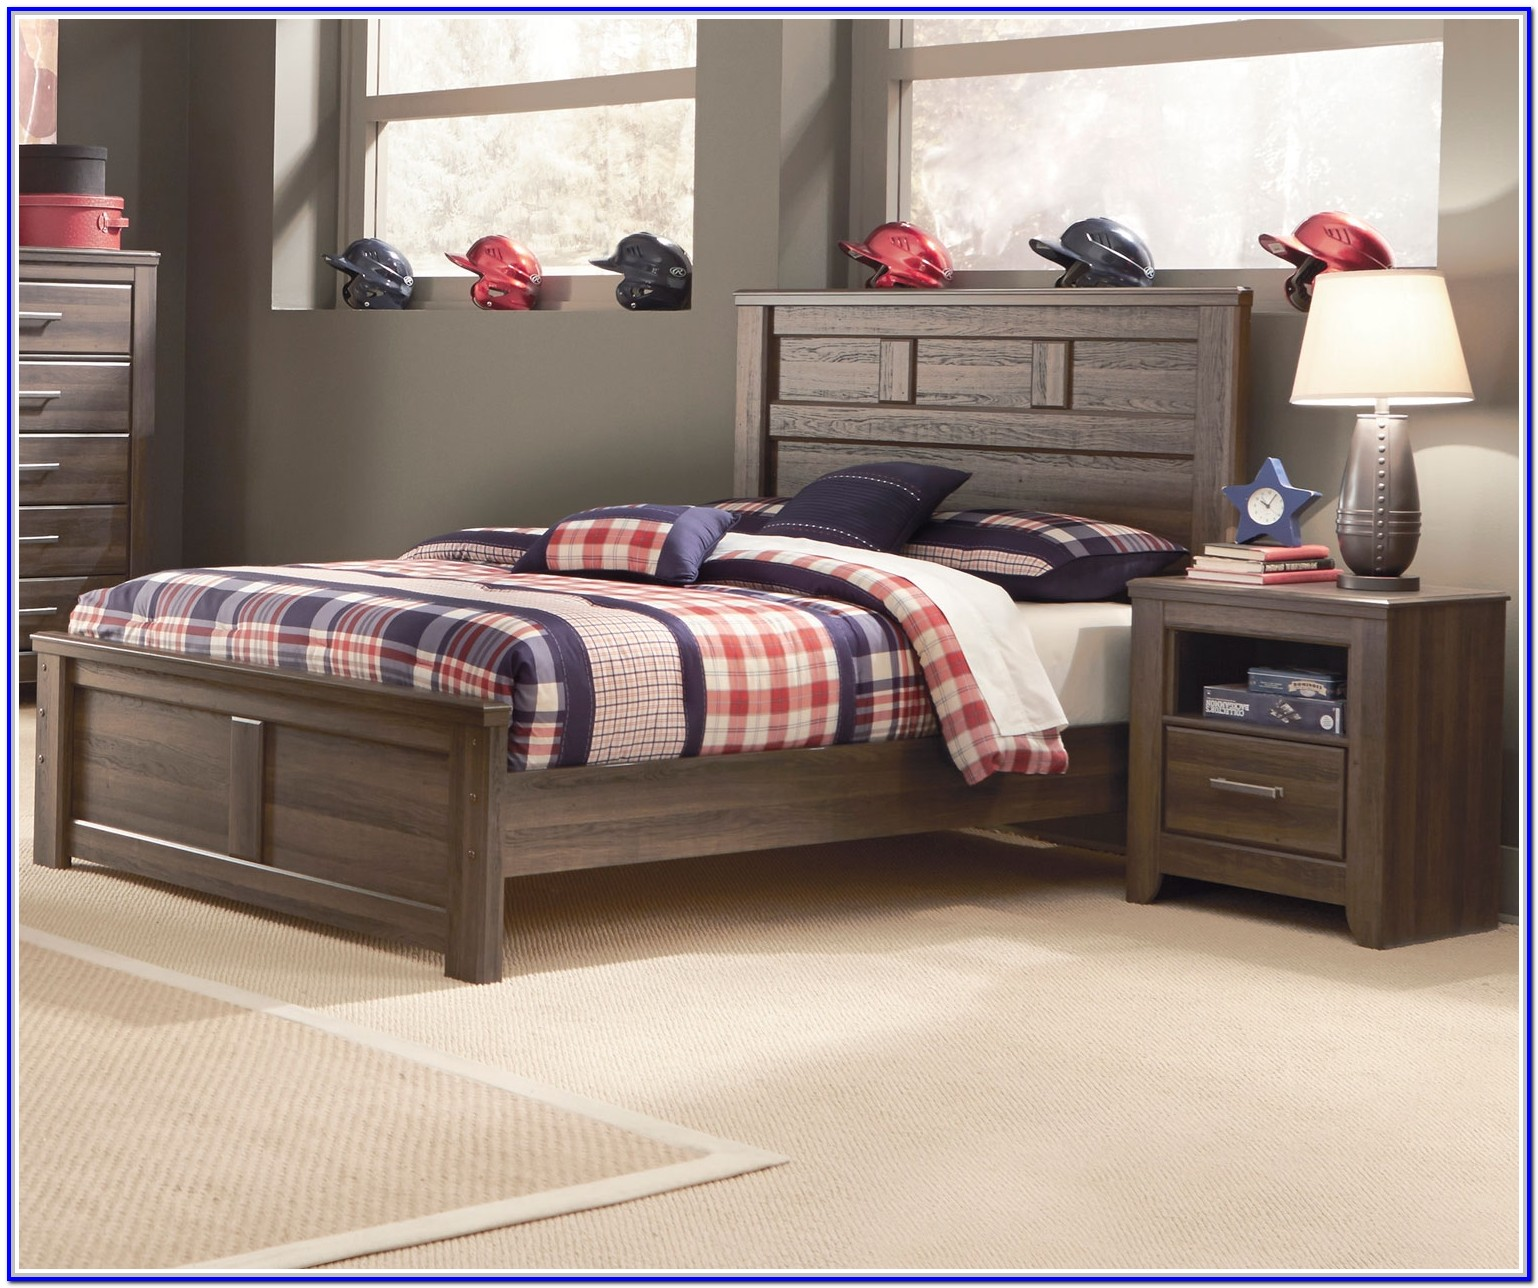 Ashley Furniture White Full Size Bed